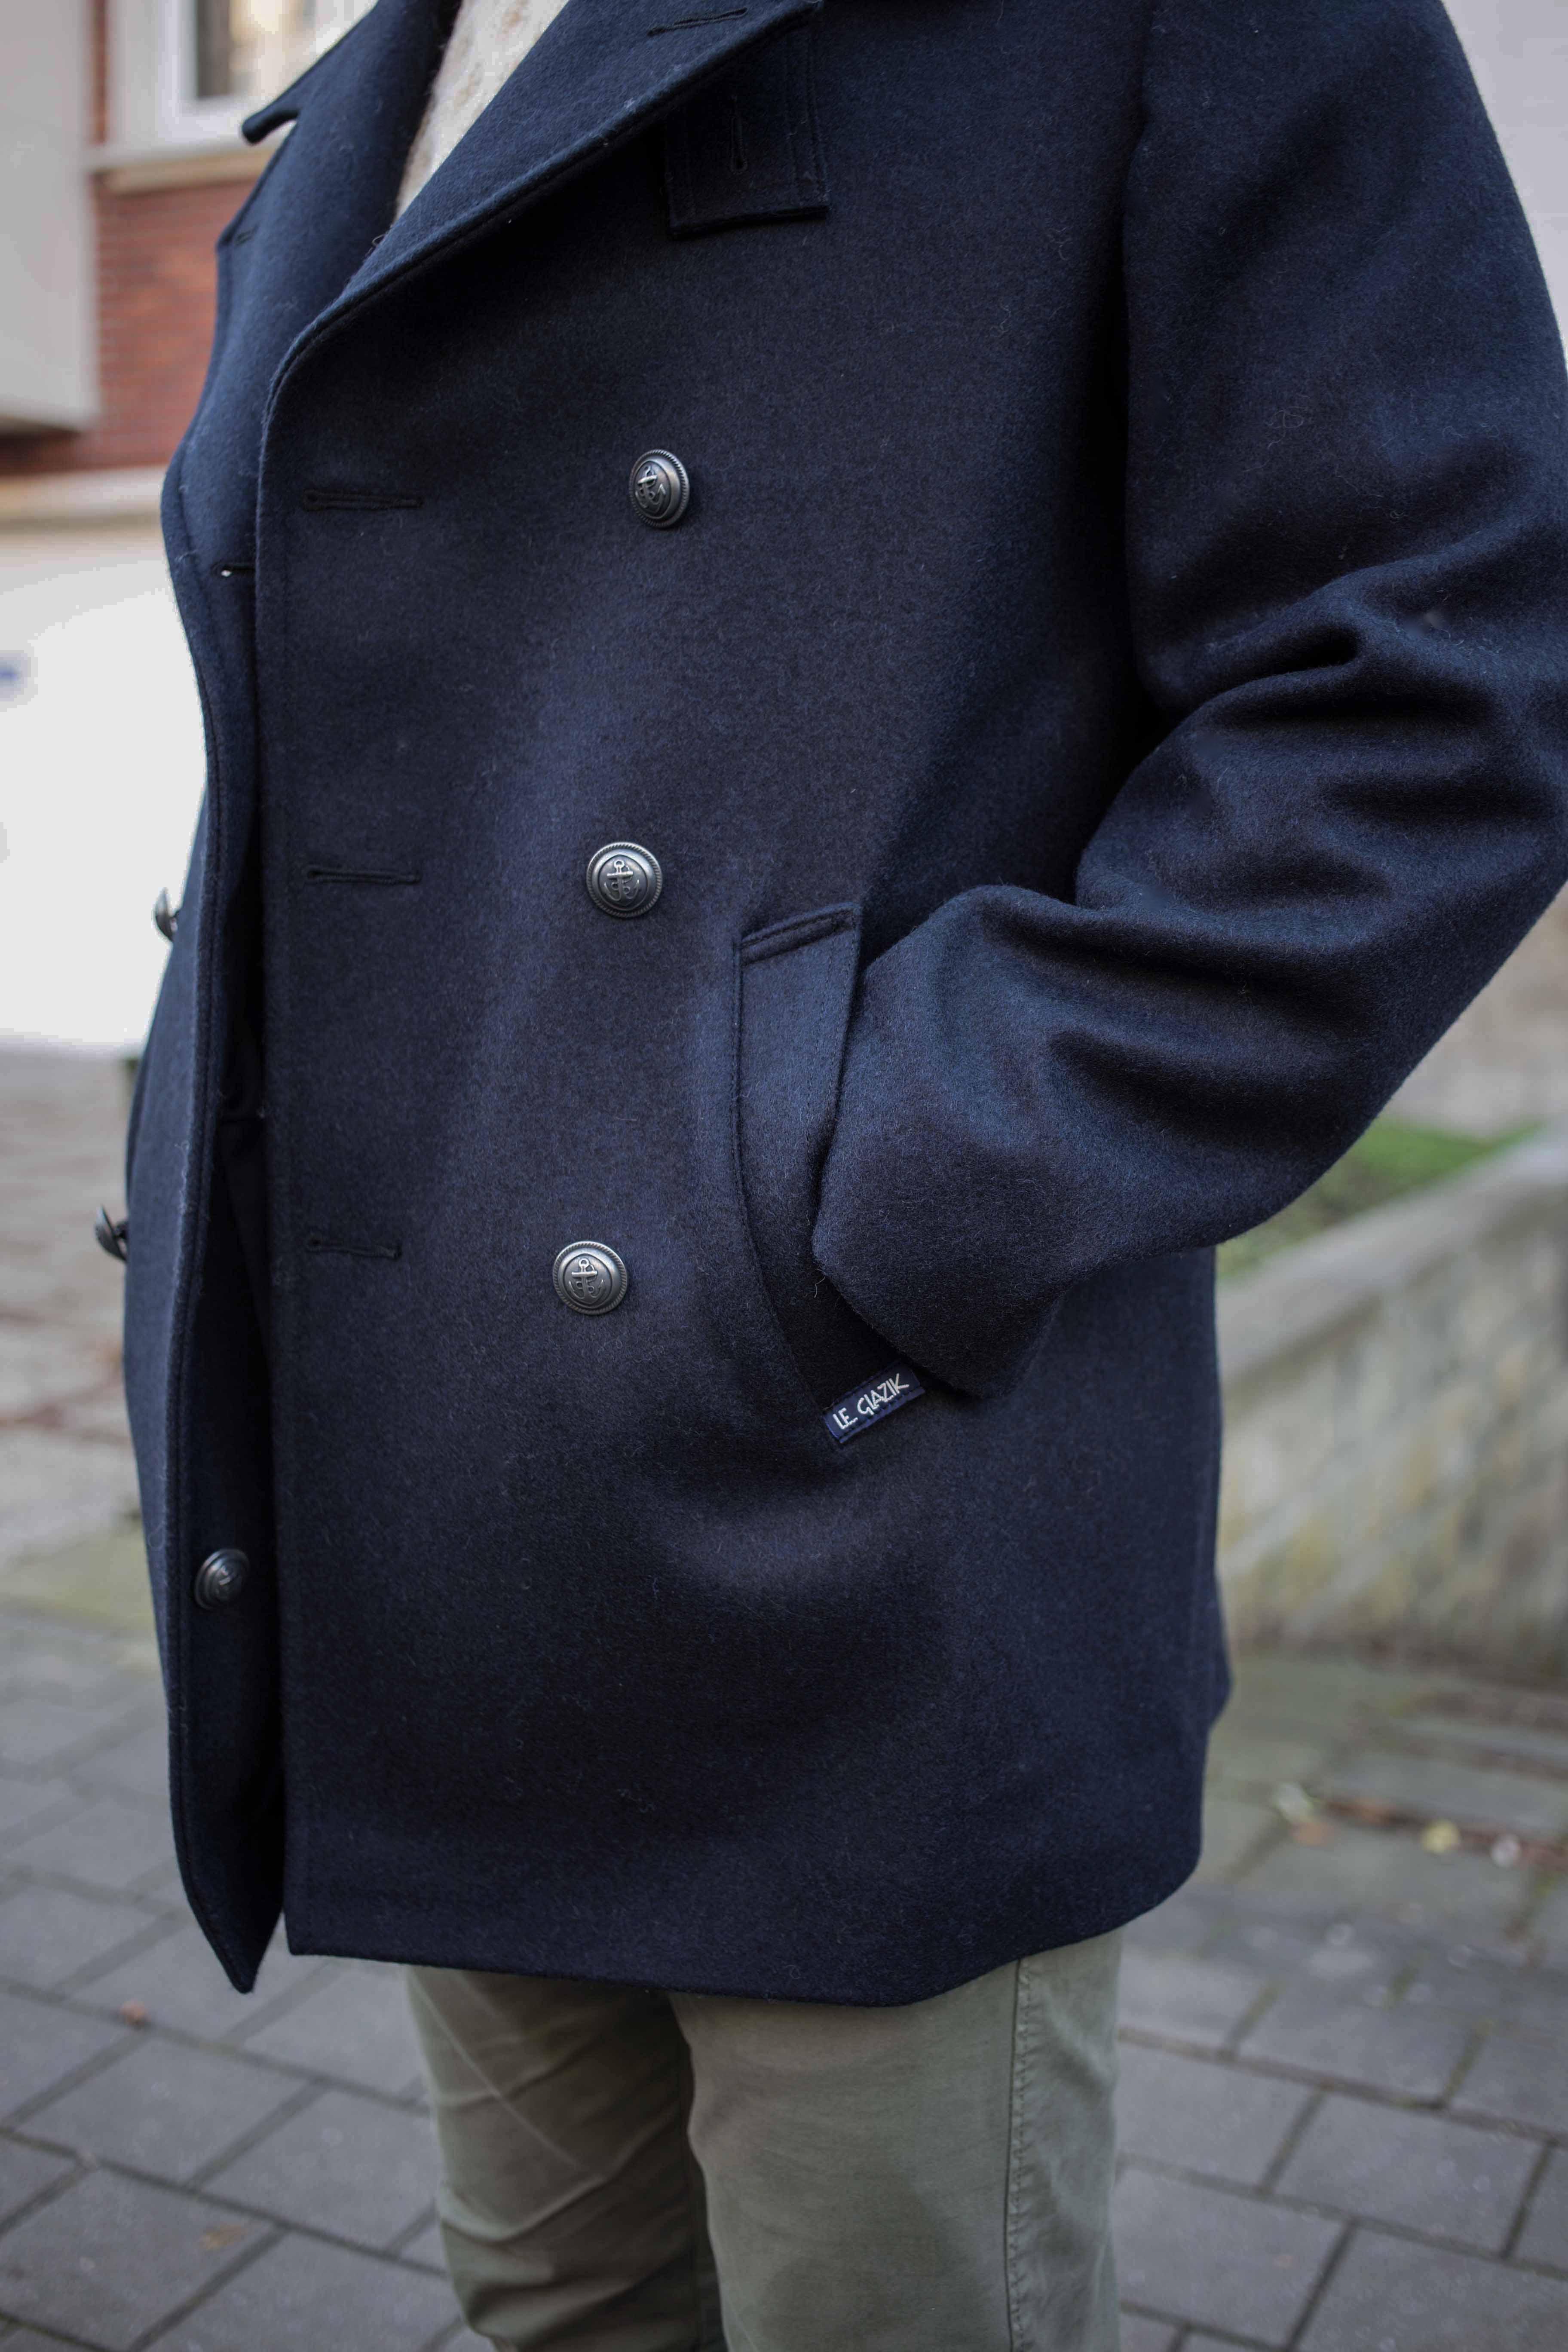 bretonische-cabanjacke-pea-coat-maritimer-look-zweireihige-jacke-beiger-strickpulli-graue-lederstiefel_0104